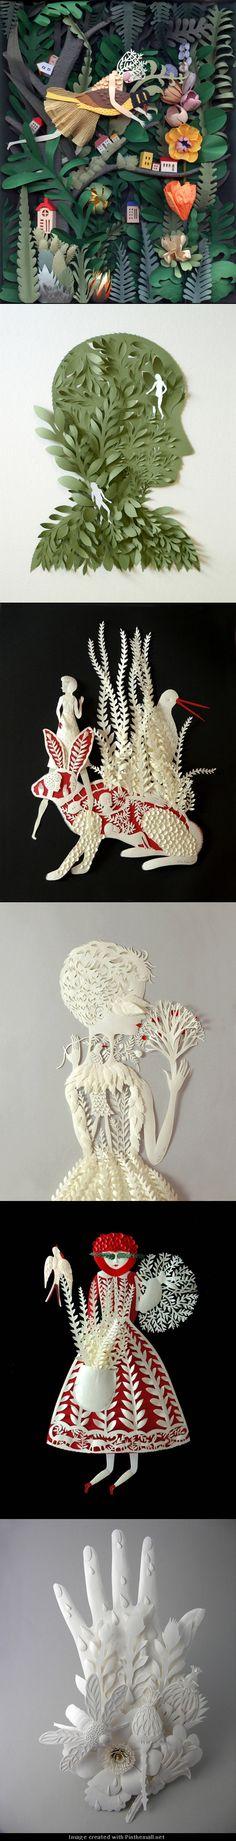 Elsa Mora cut paper art - created via http://pinthemall.net